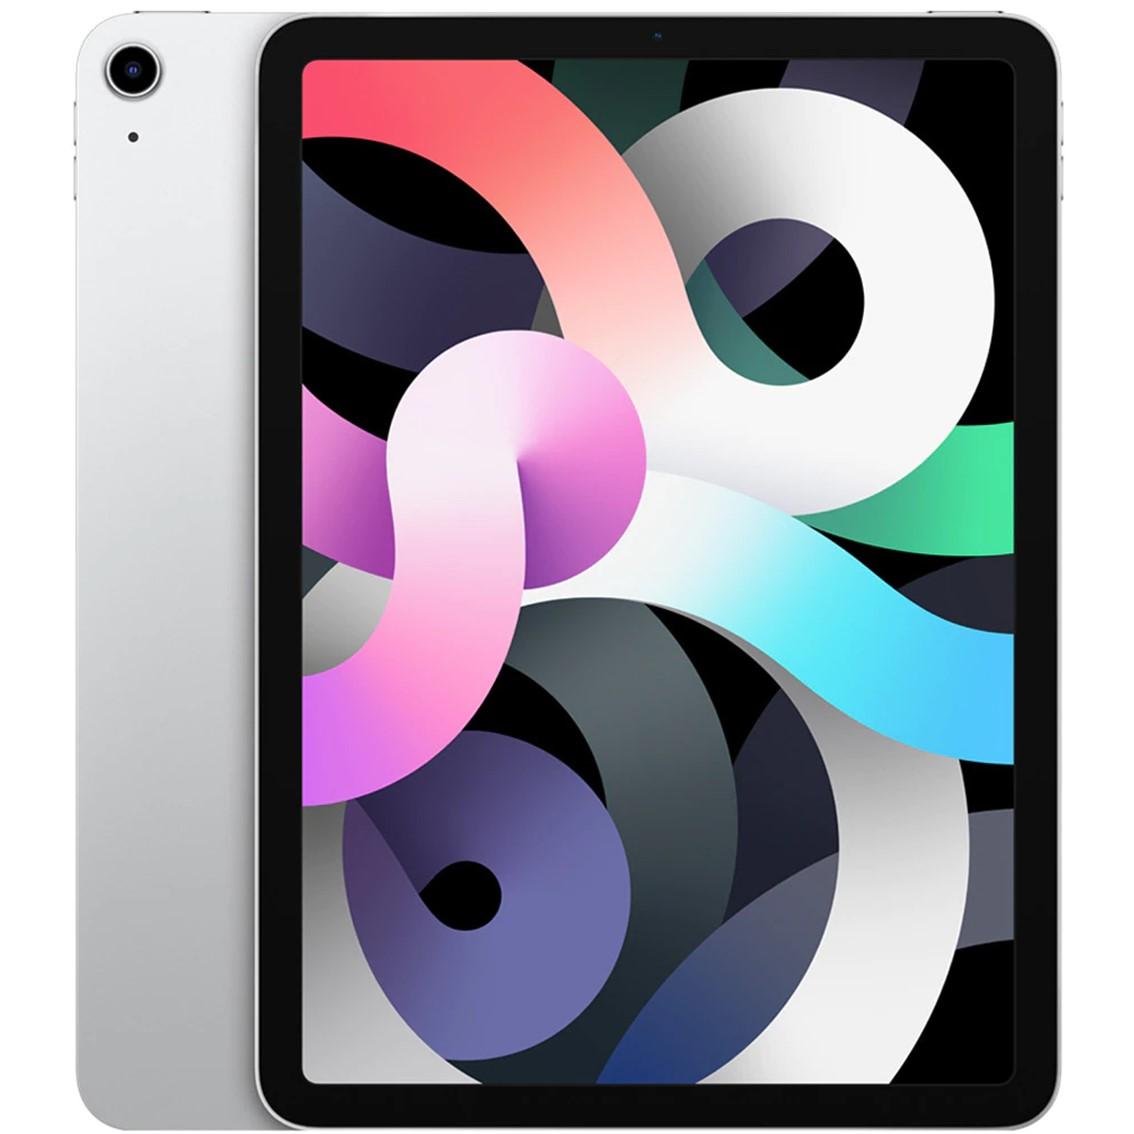 Apple ipad air 4 10.9  2020 256gb wifi silver 8gen 10.9 - liquid retina - a14 - 12mpx - comp. apple pencil 2 myfw2ty - a